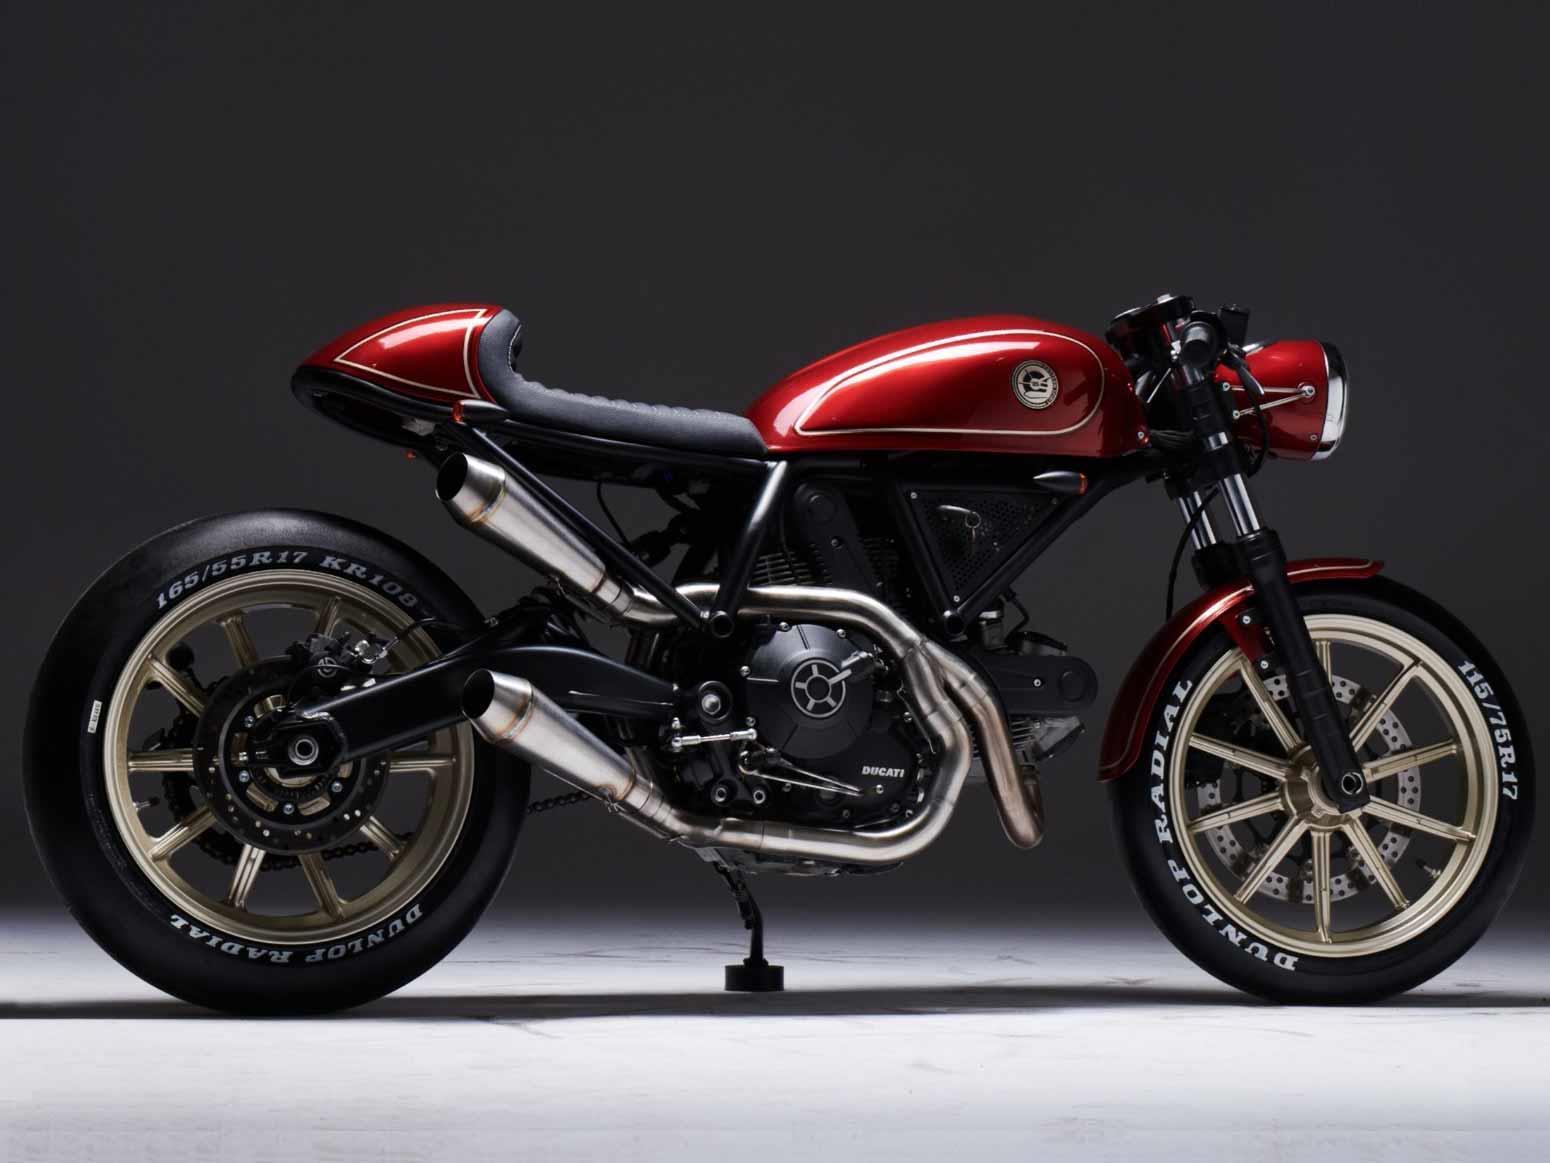 Ducati 'Custom Rumble' finalist bike